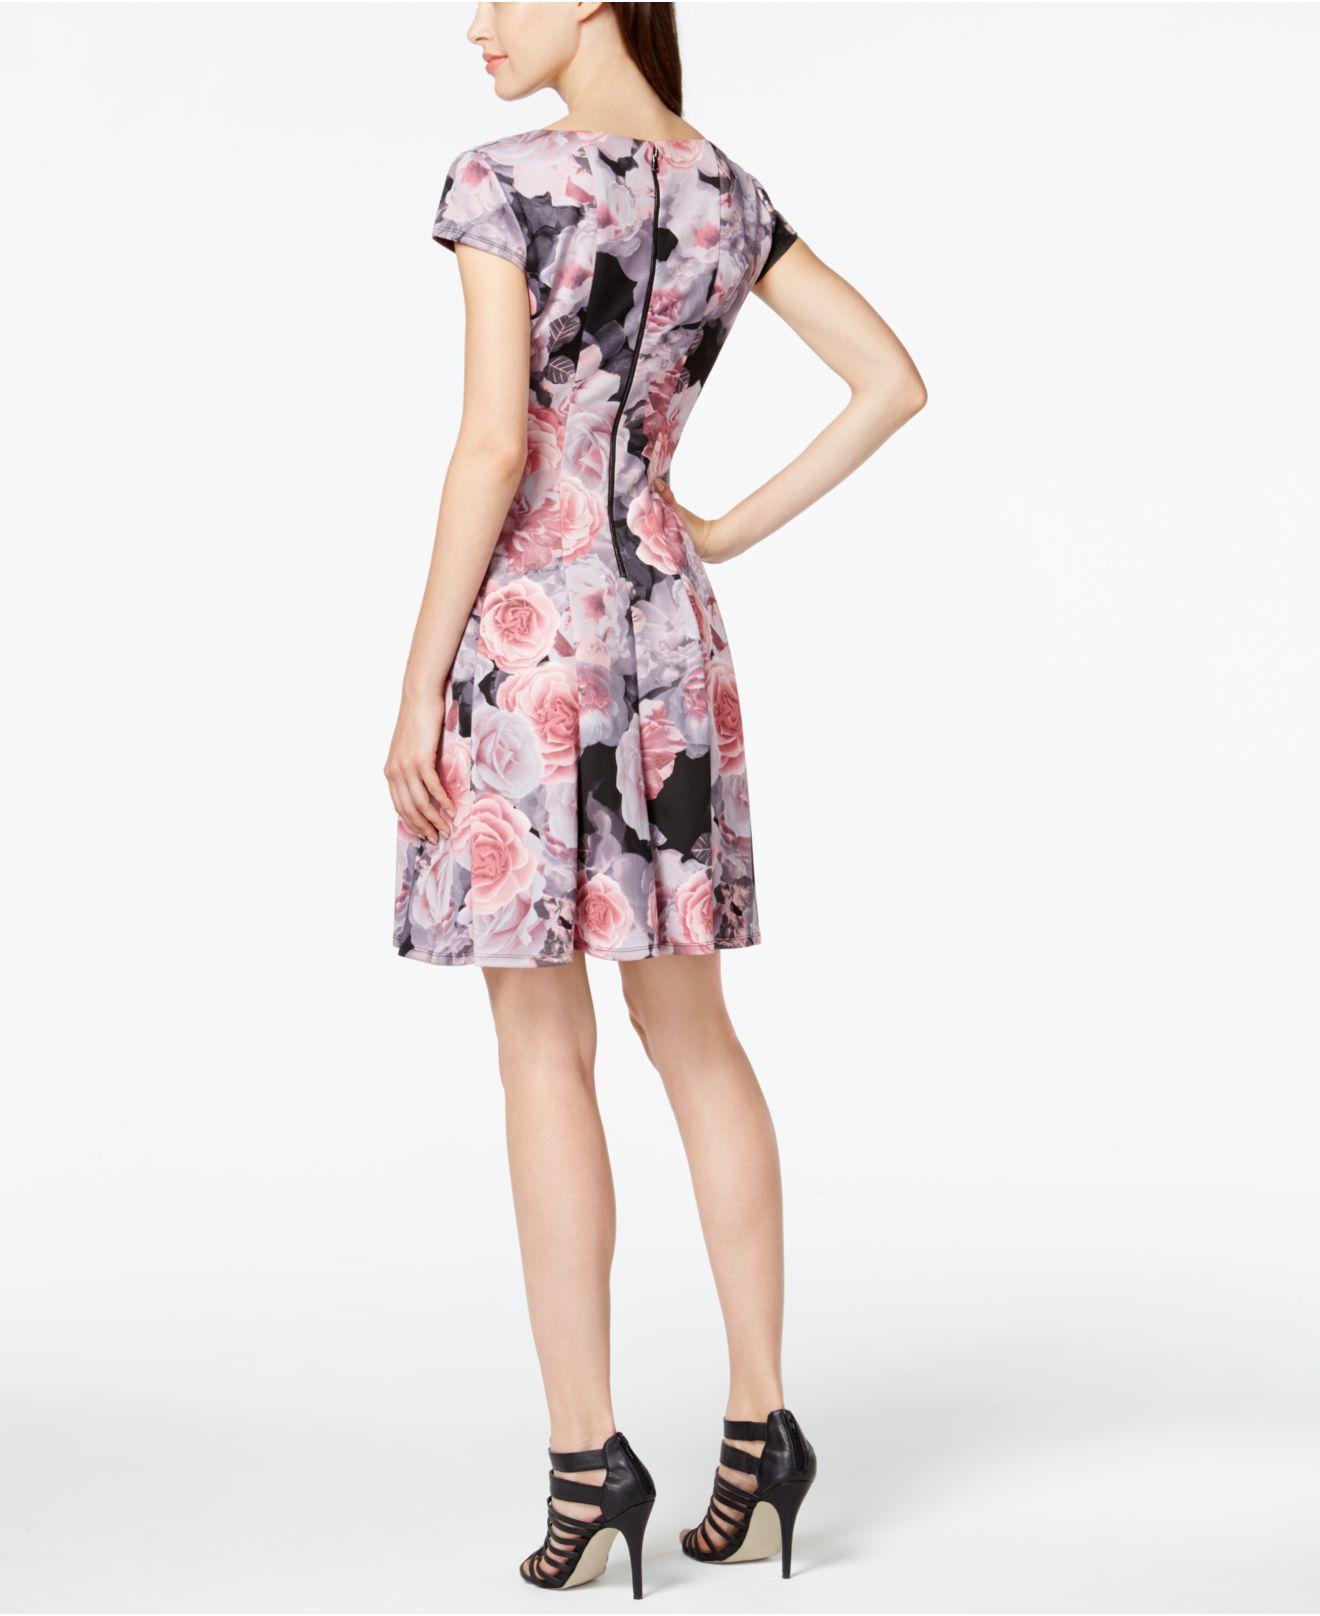 Funky Betsey Johnson Tea Party Dress Mold - Wedding Plan Ideas ...